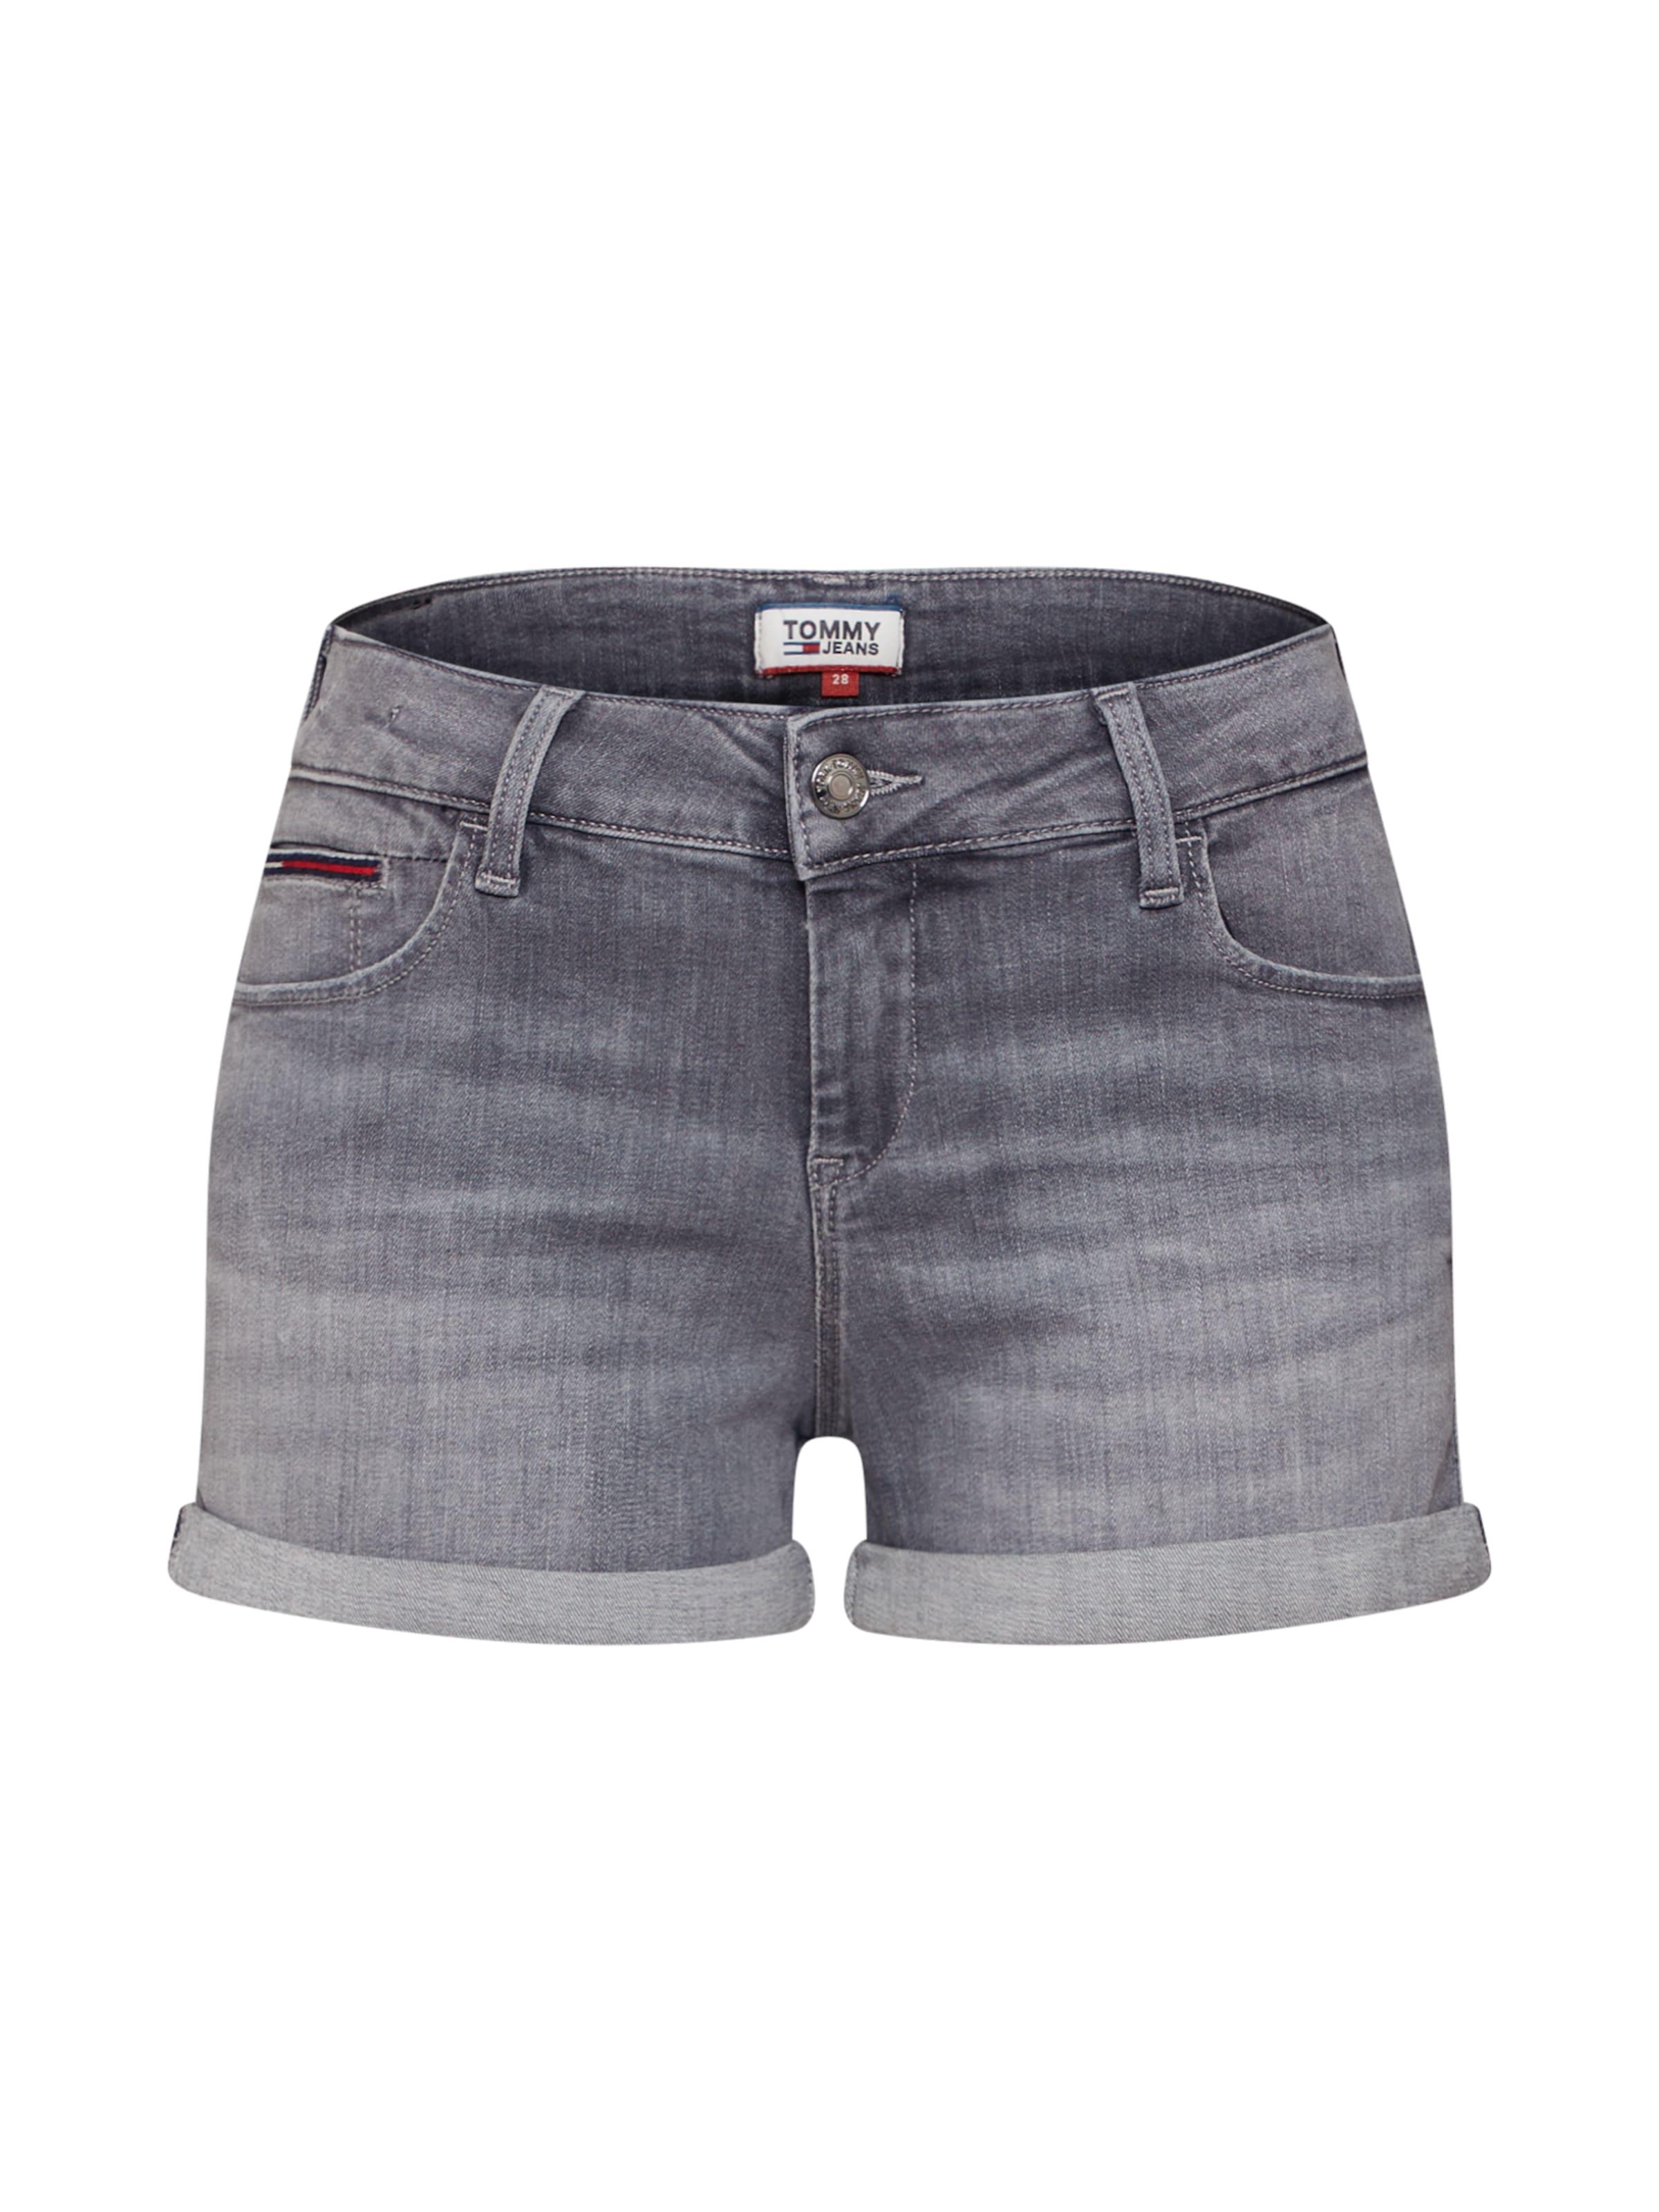 Tommy Grey Grey Jeans Denim Tommy In Jeans Denim In Jeans In Grey Tommy NPwkX8n0O